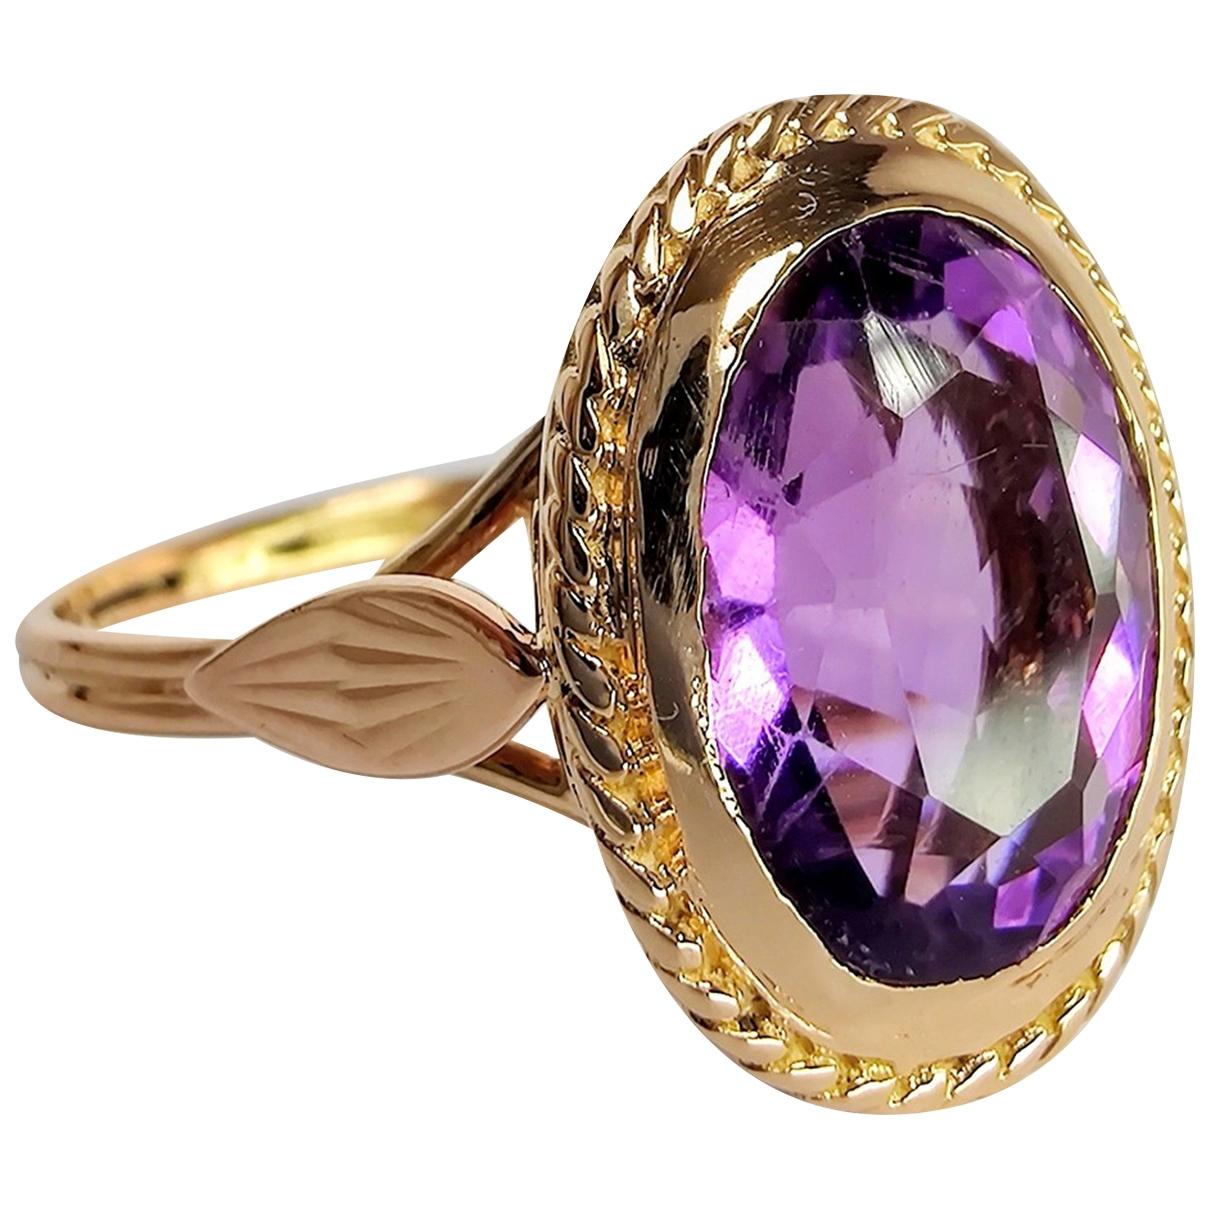 - Bague Amethyste pour femme en or jaune - violet